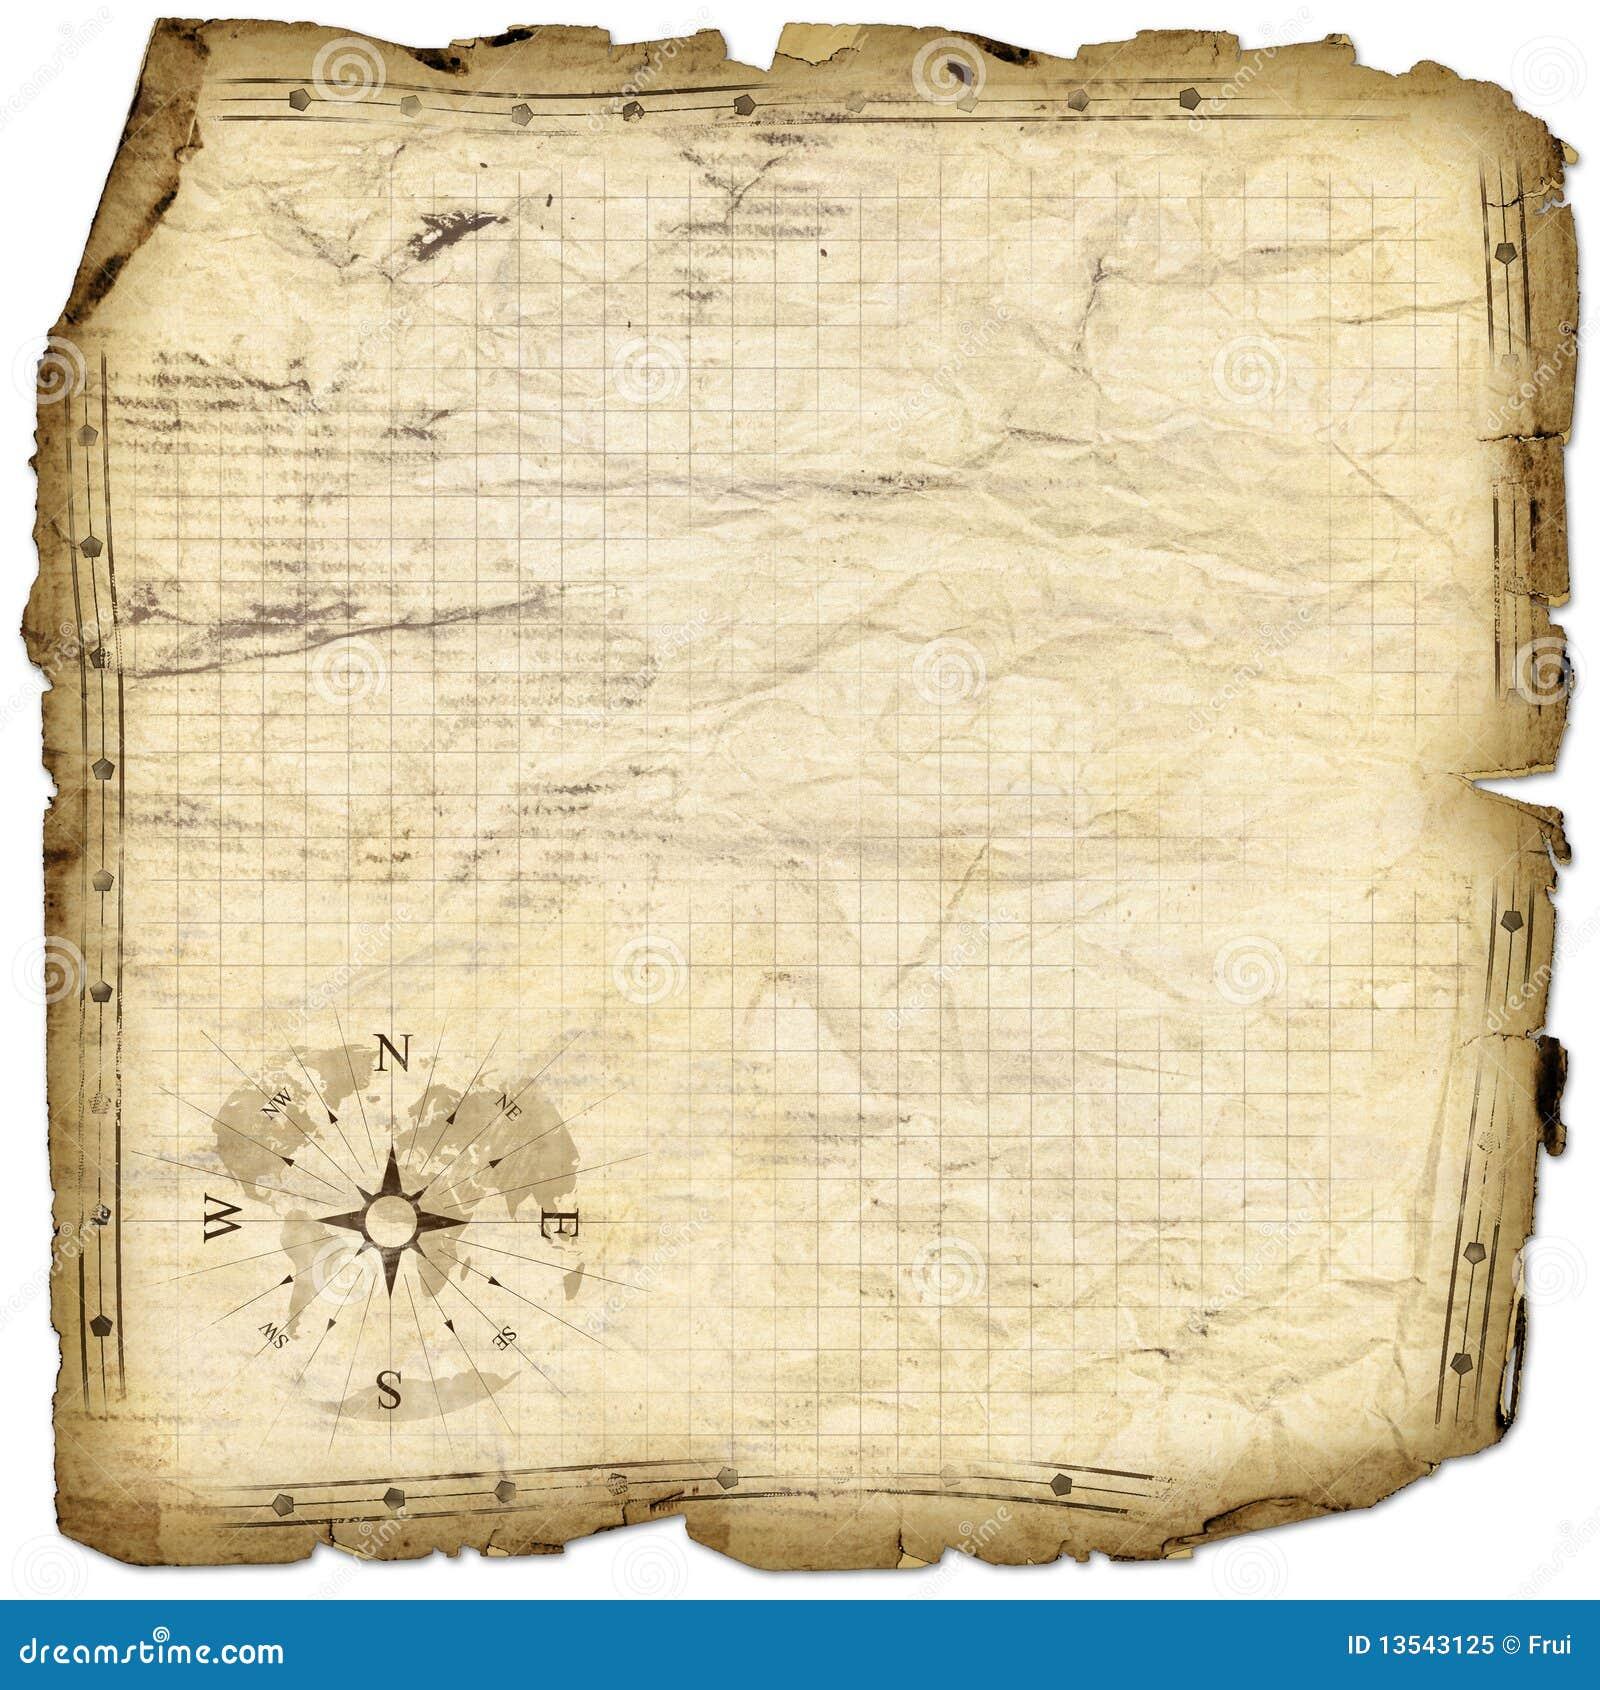 Treasure Map Royalty Free Stock Photo - Image: 13543125